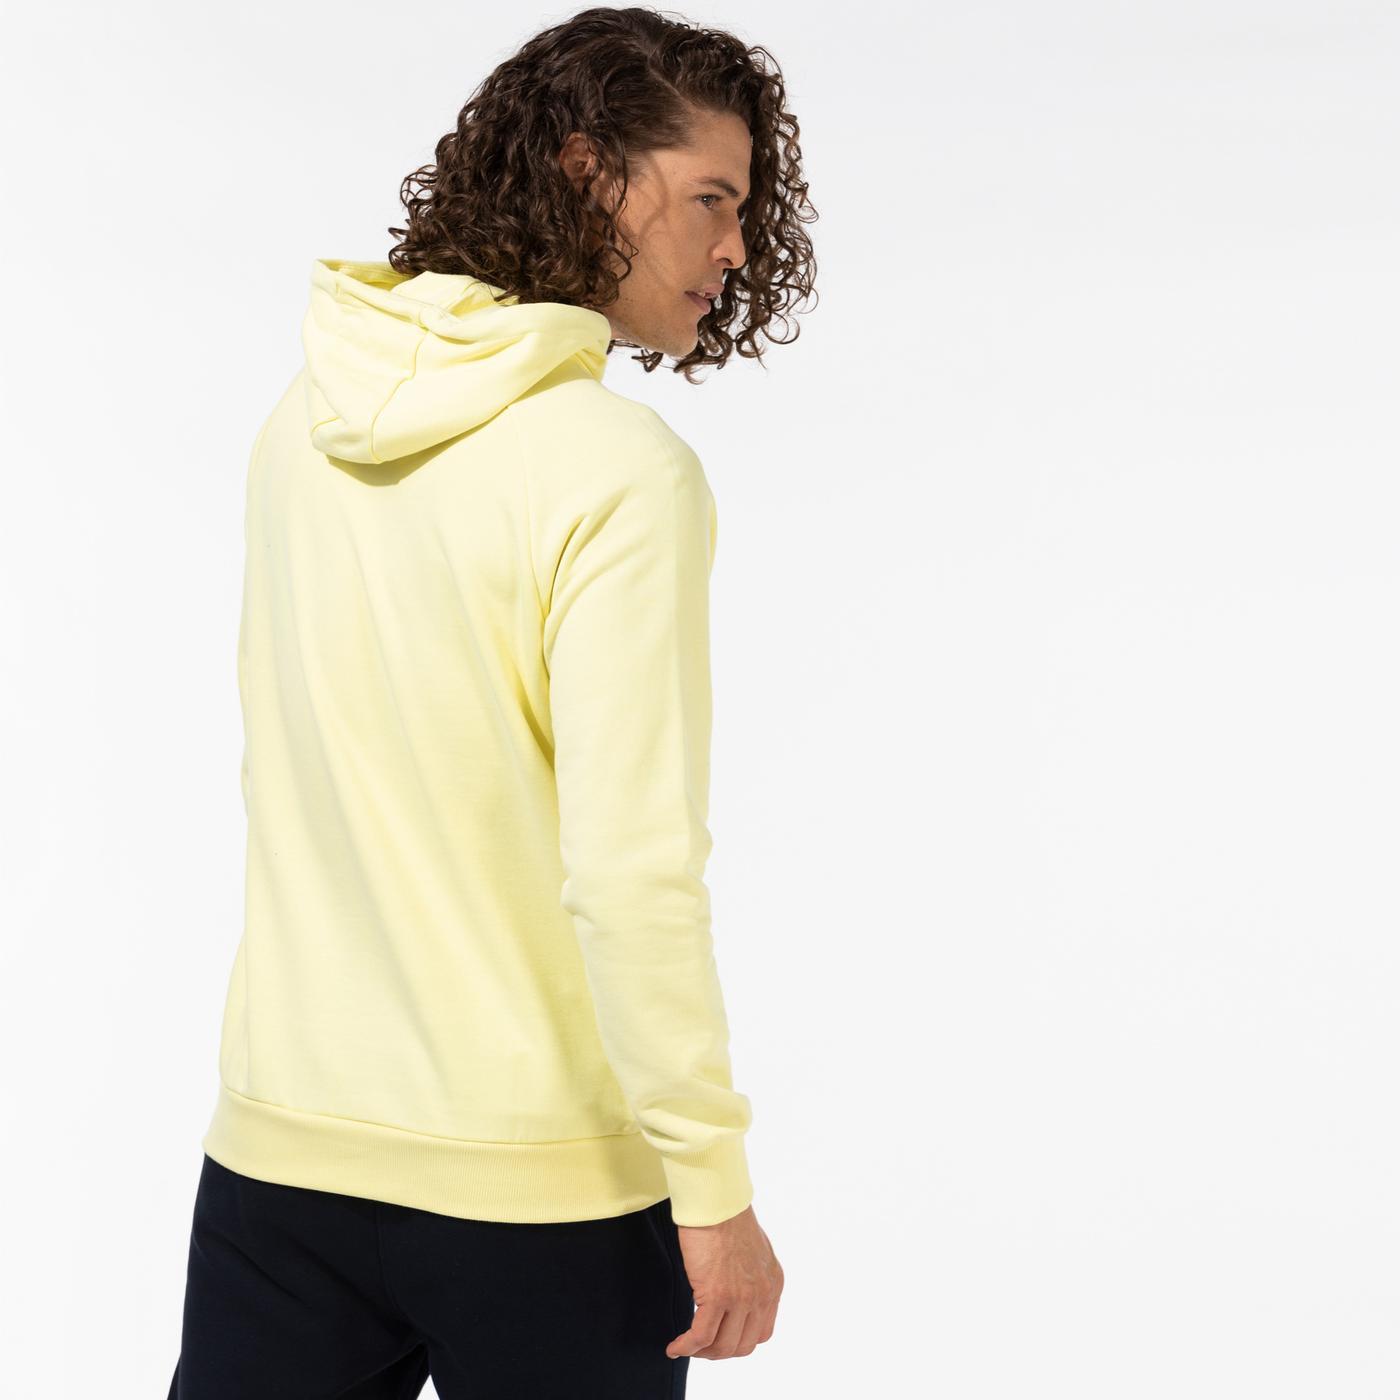 Puma International Graphic Erkek Sarı Kapüşonlu Sweatshirt